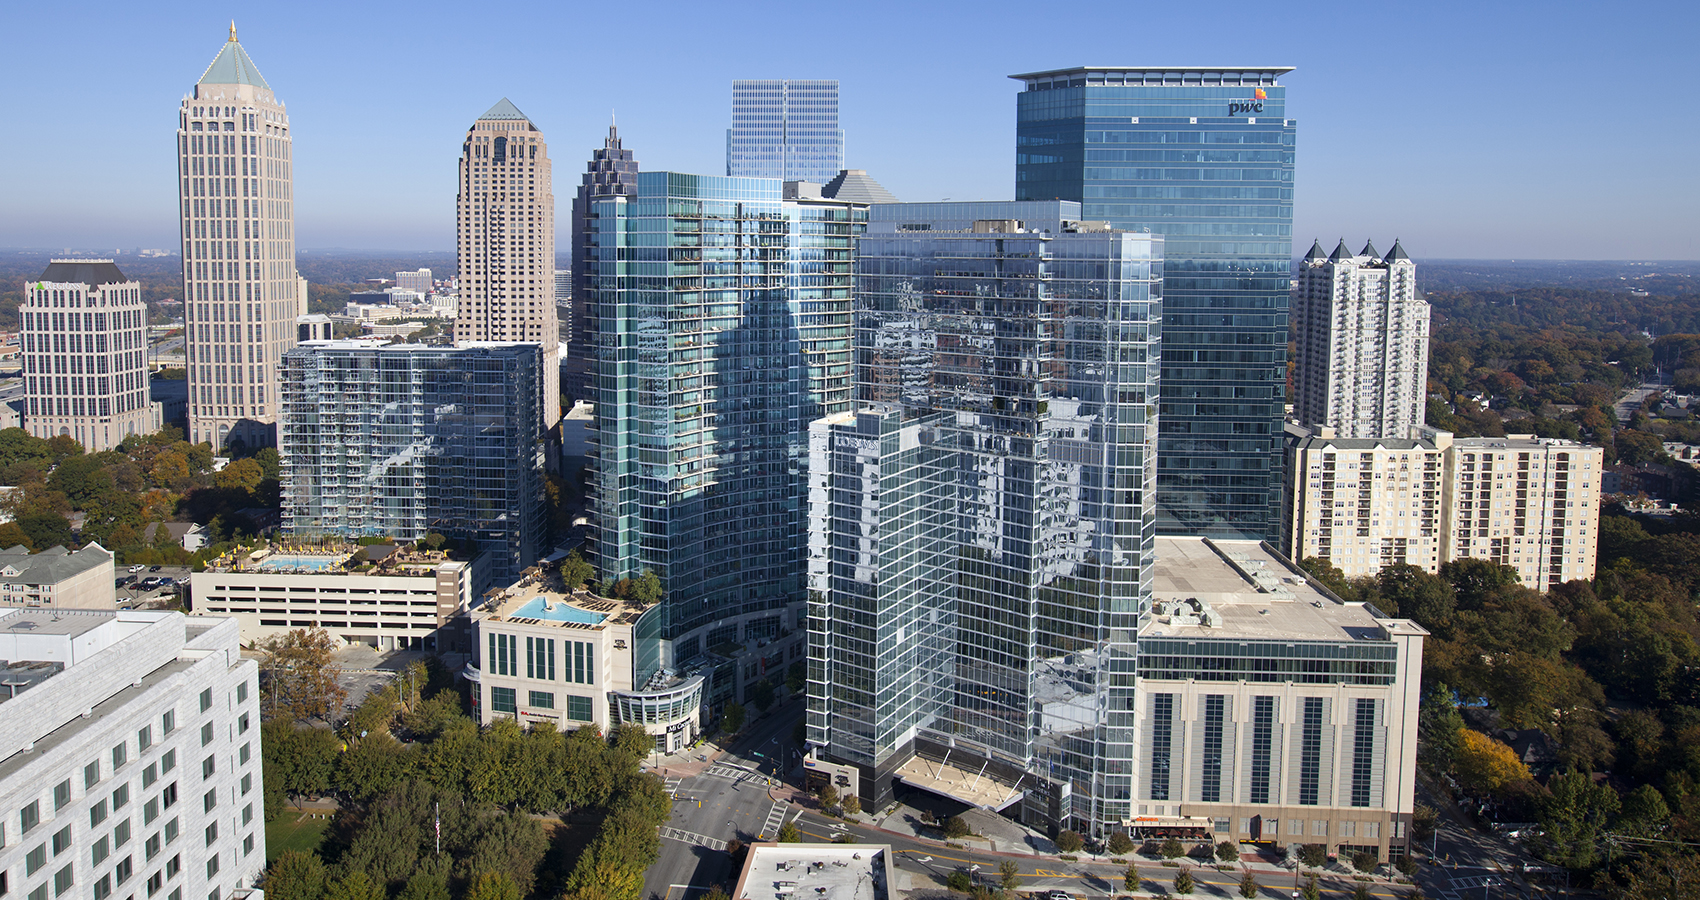 daniel commercial real estate developer and management in